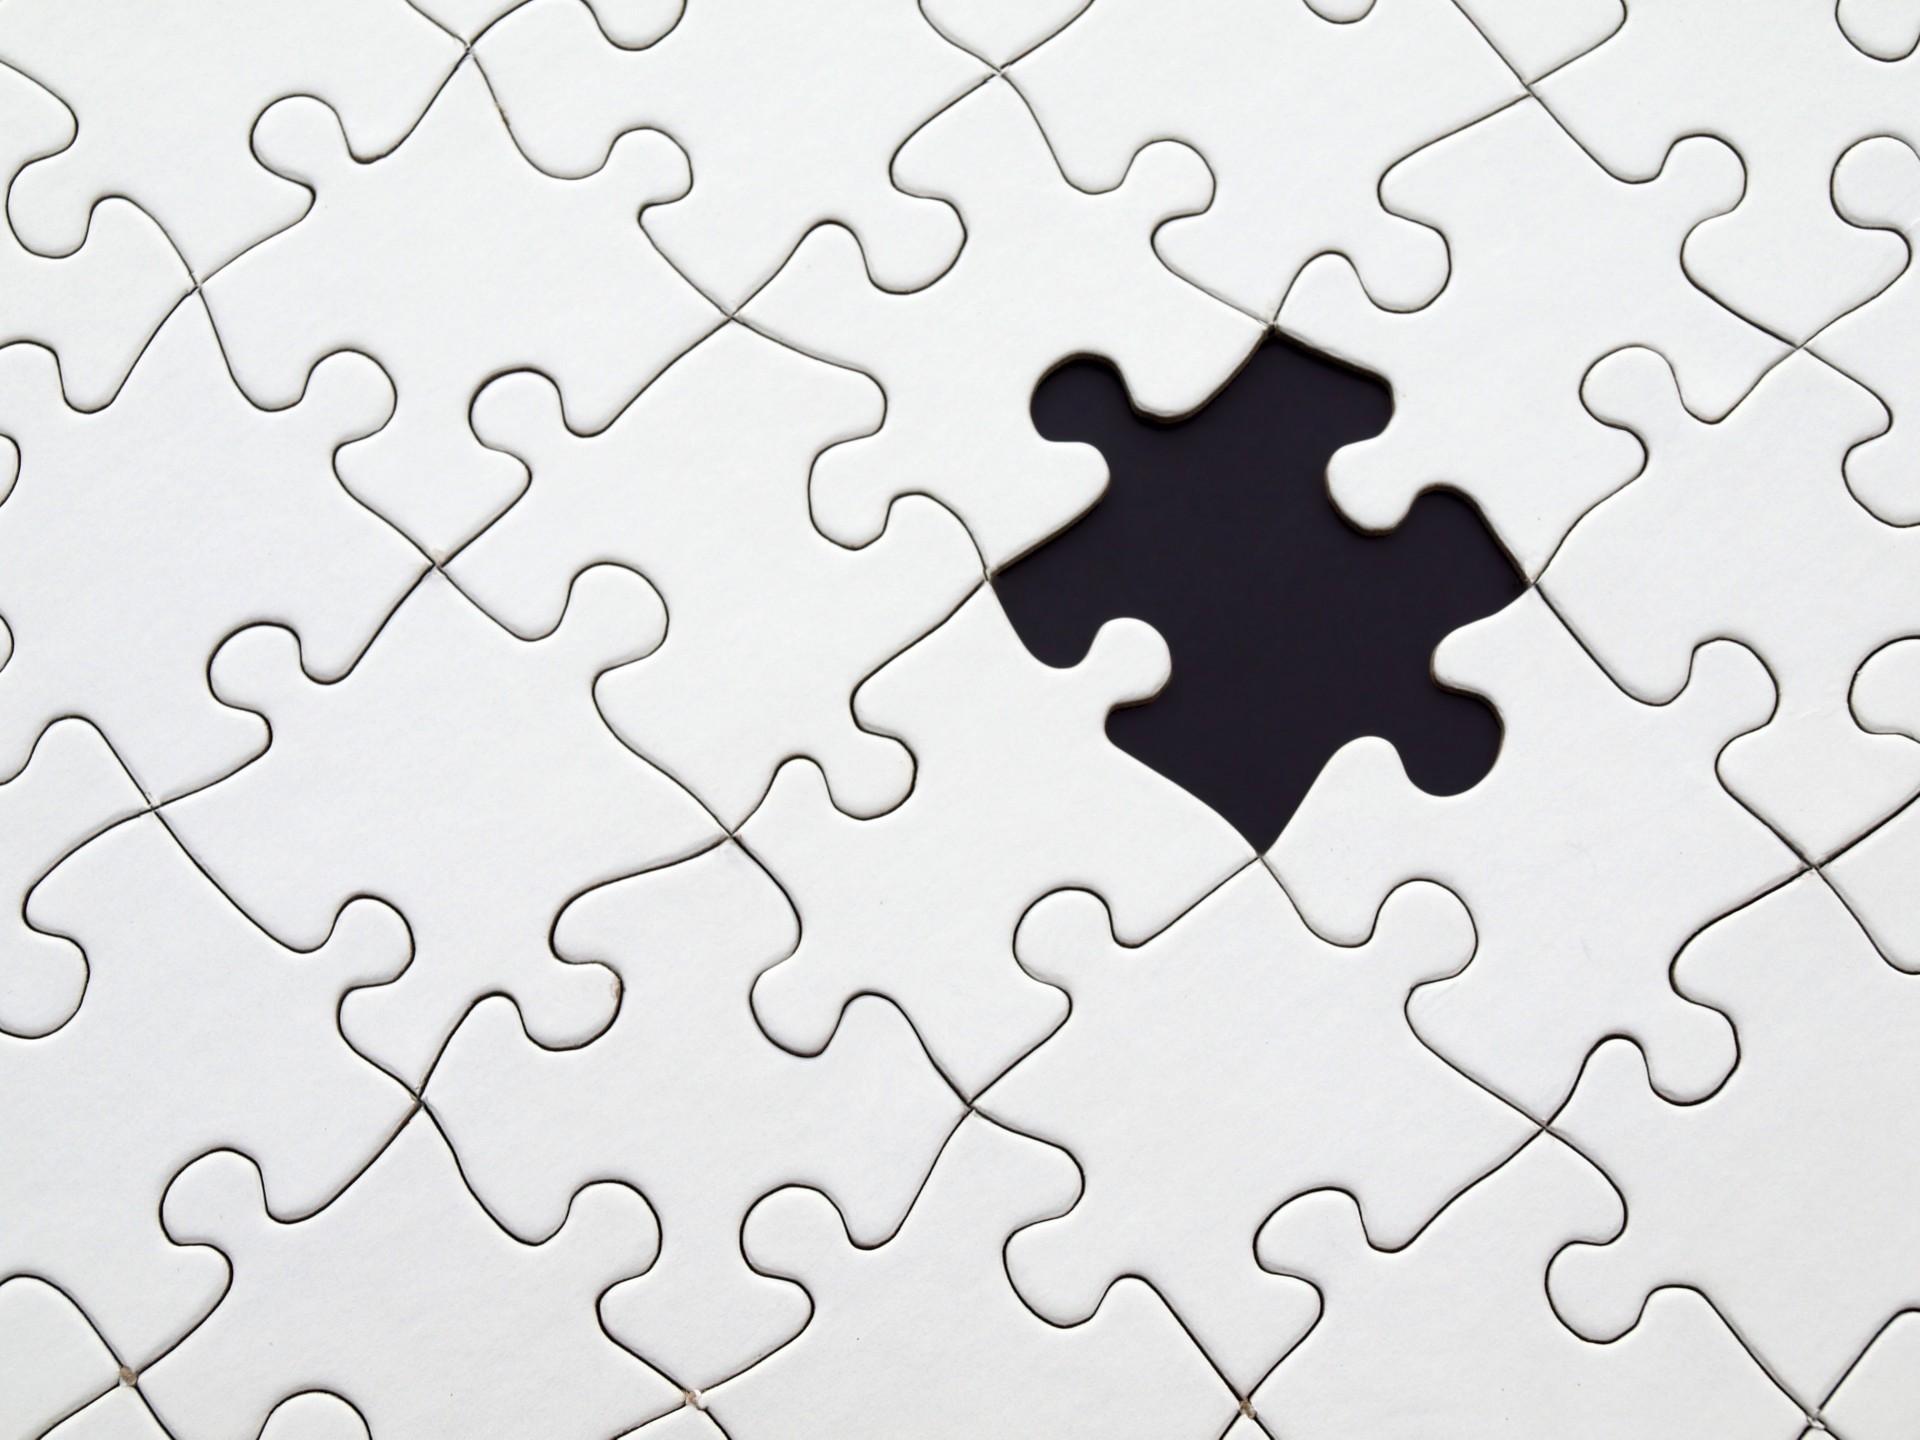 El desafío de diagnosticar antes la enfermedad de Alzheimer